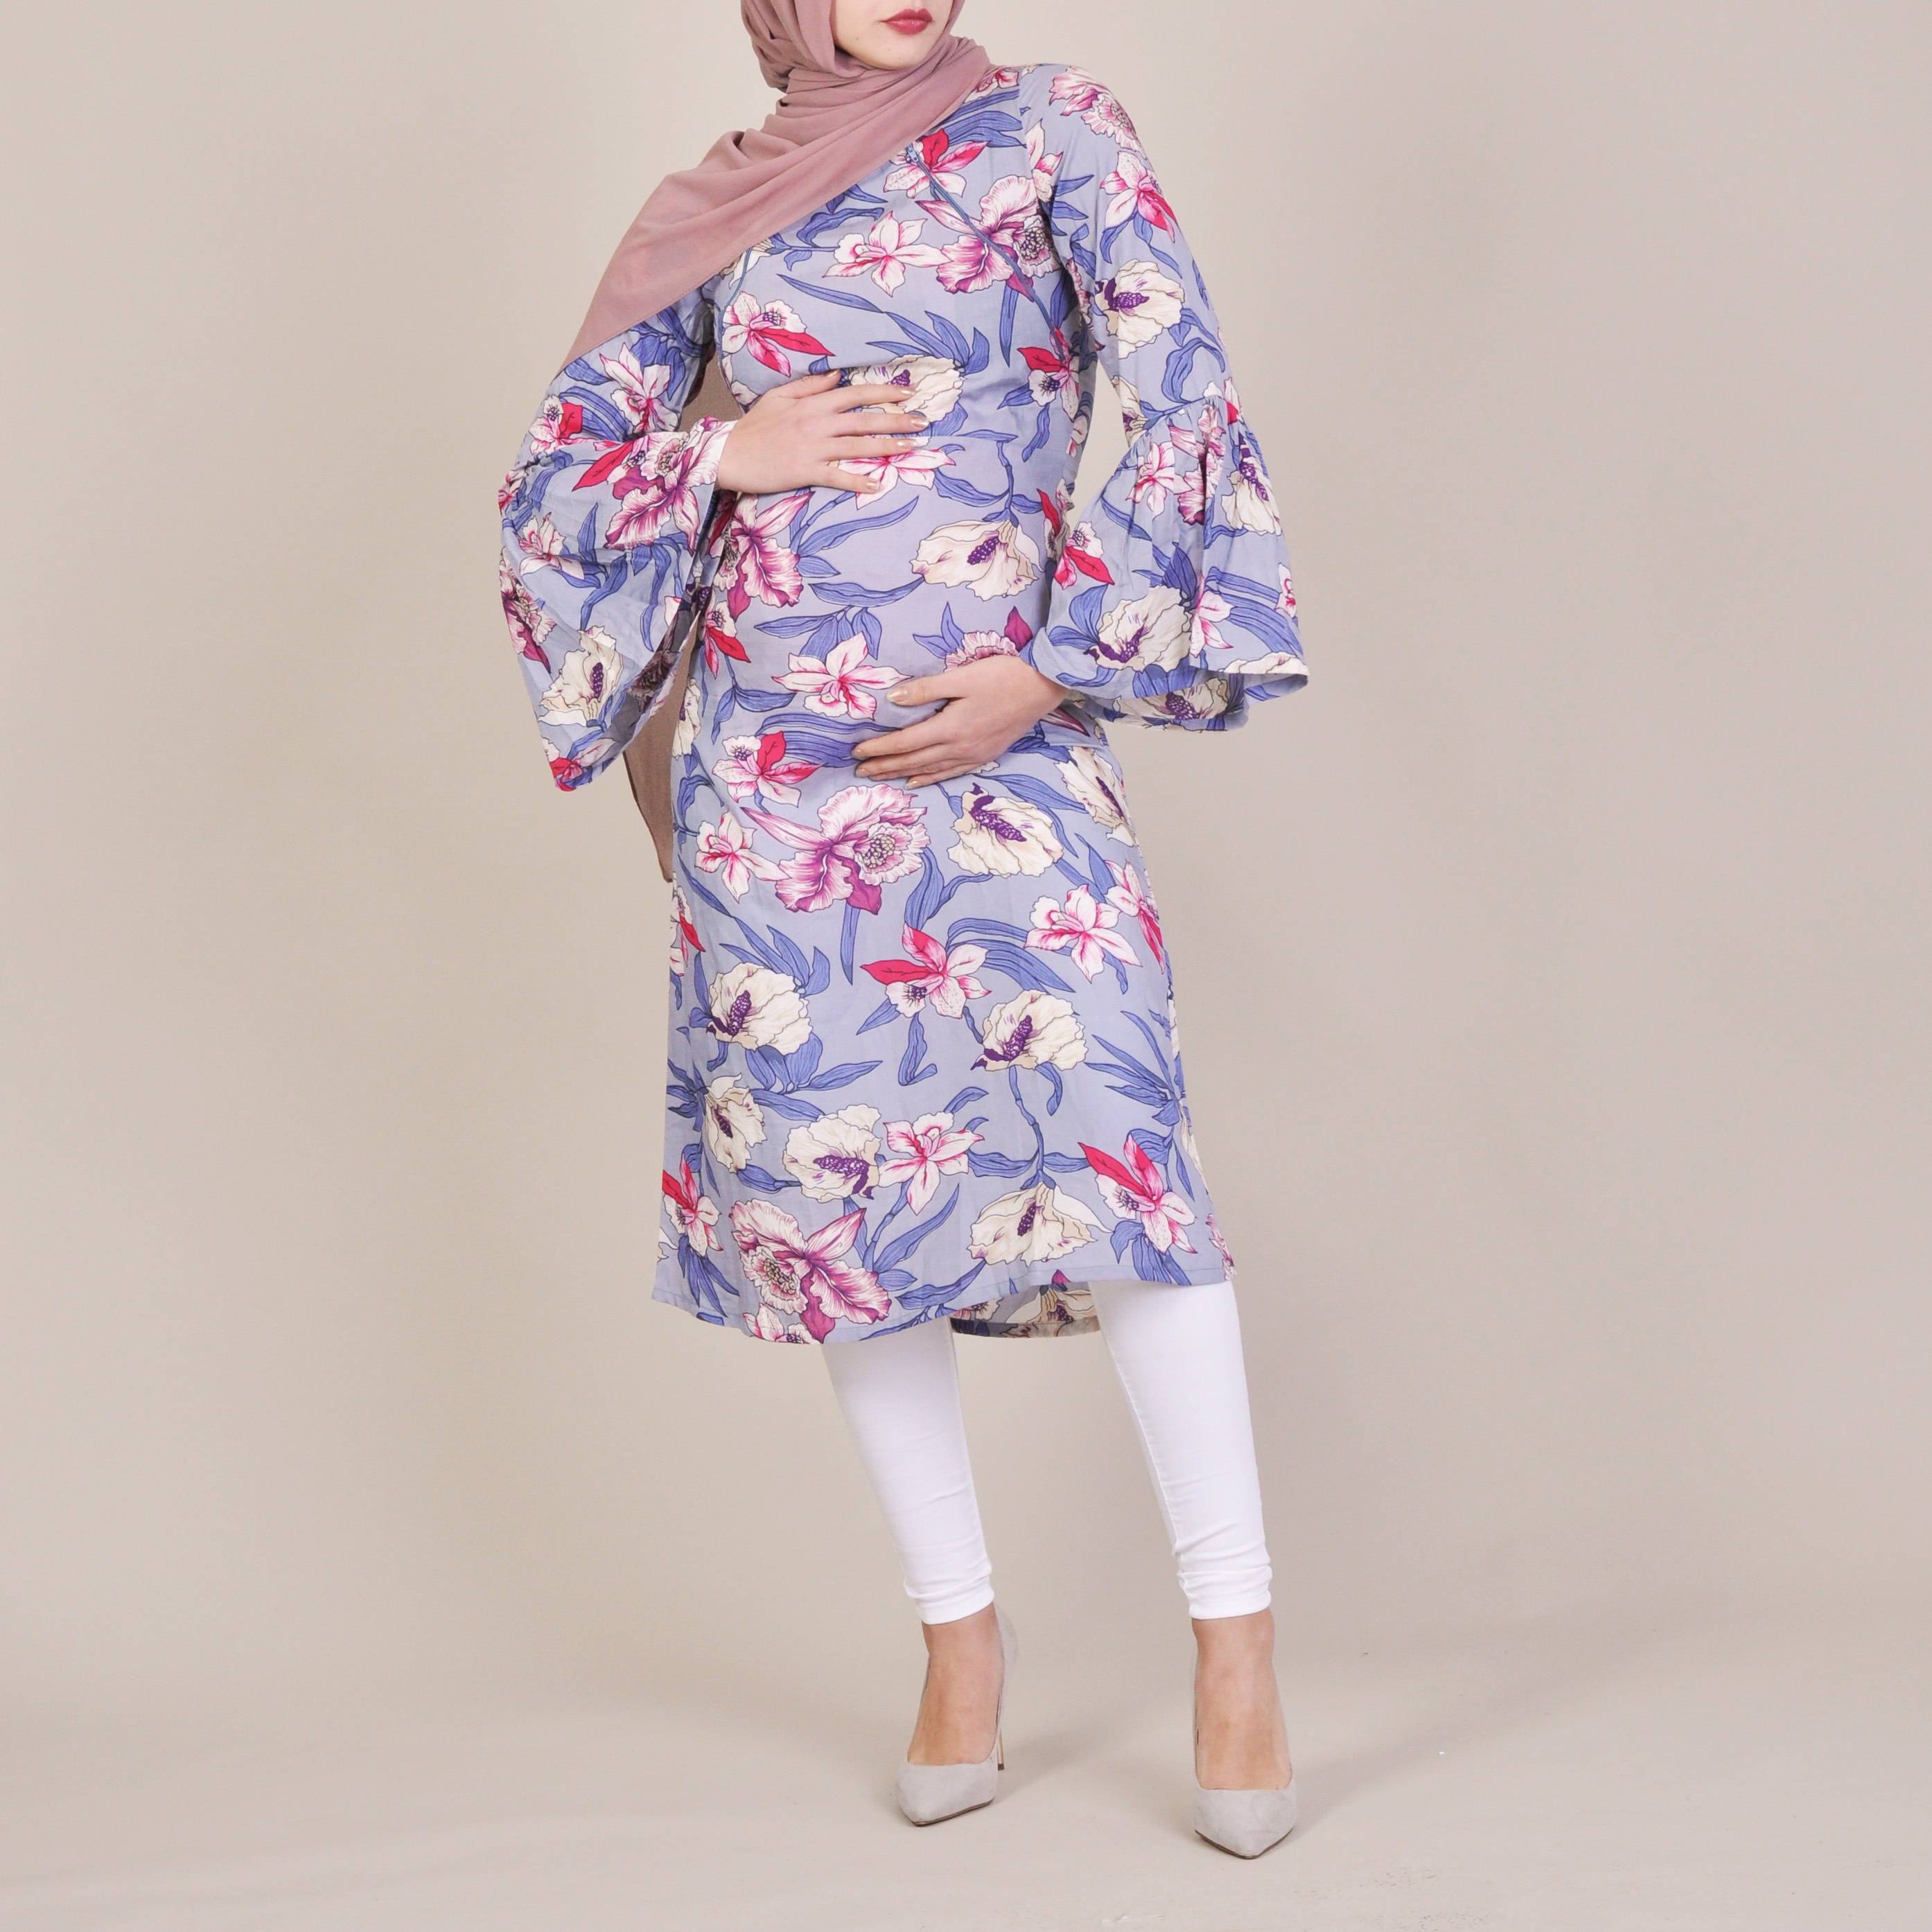 fef2801b77f8c Athena | Floral Printed Maternity Dress Shop Online | BIAH